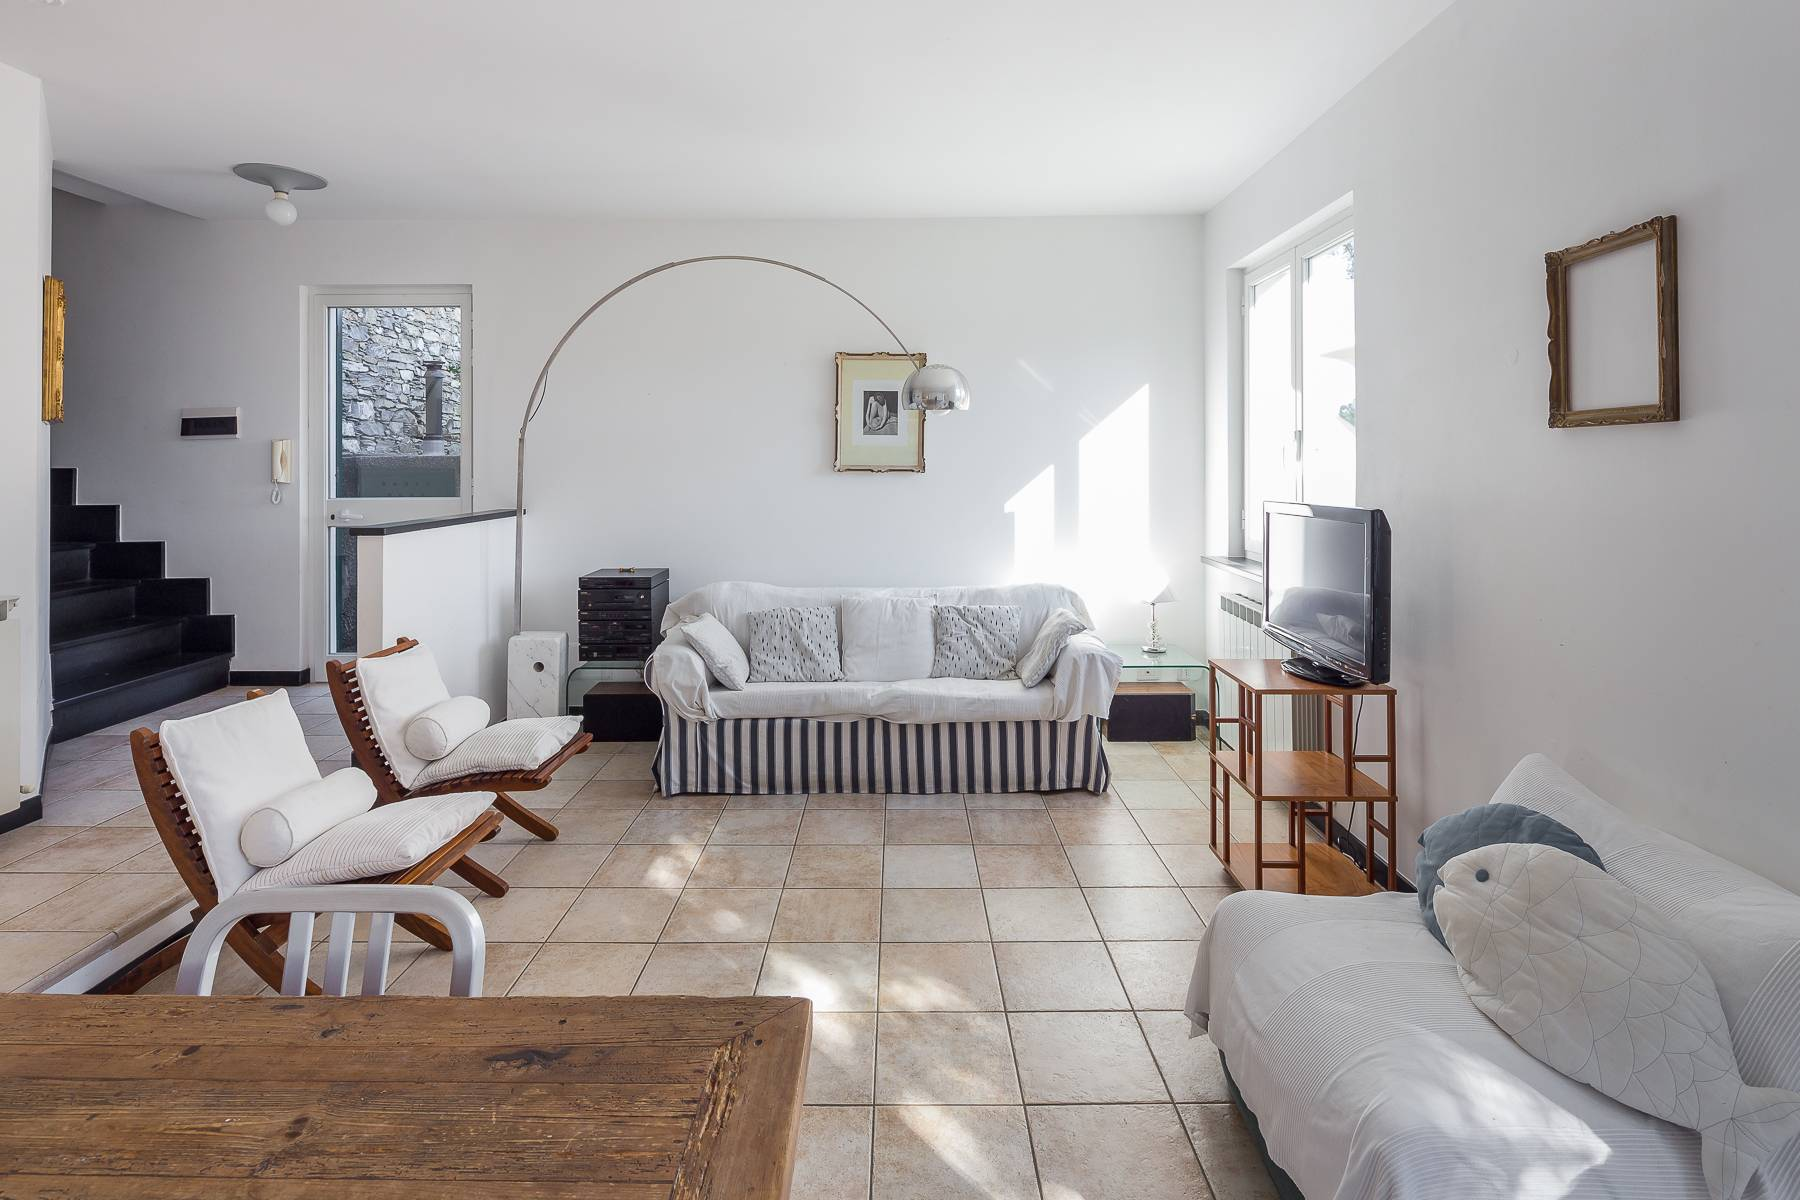 Casa indipendente in Vendita a Zoagli: 5 locali, 100 mq - Foto 18